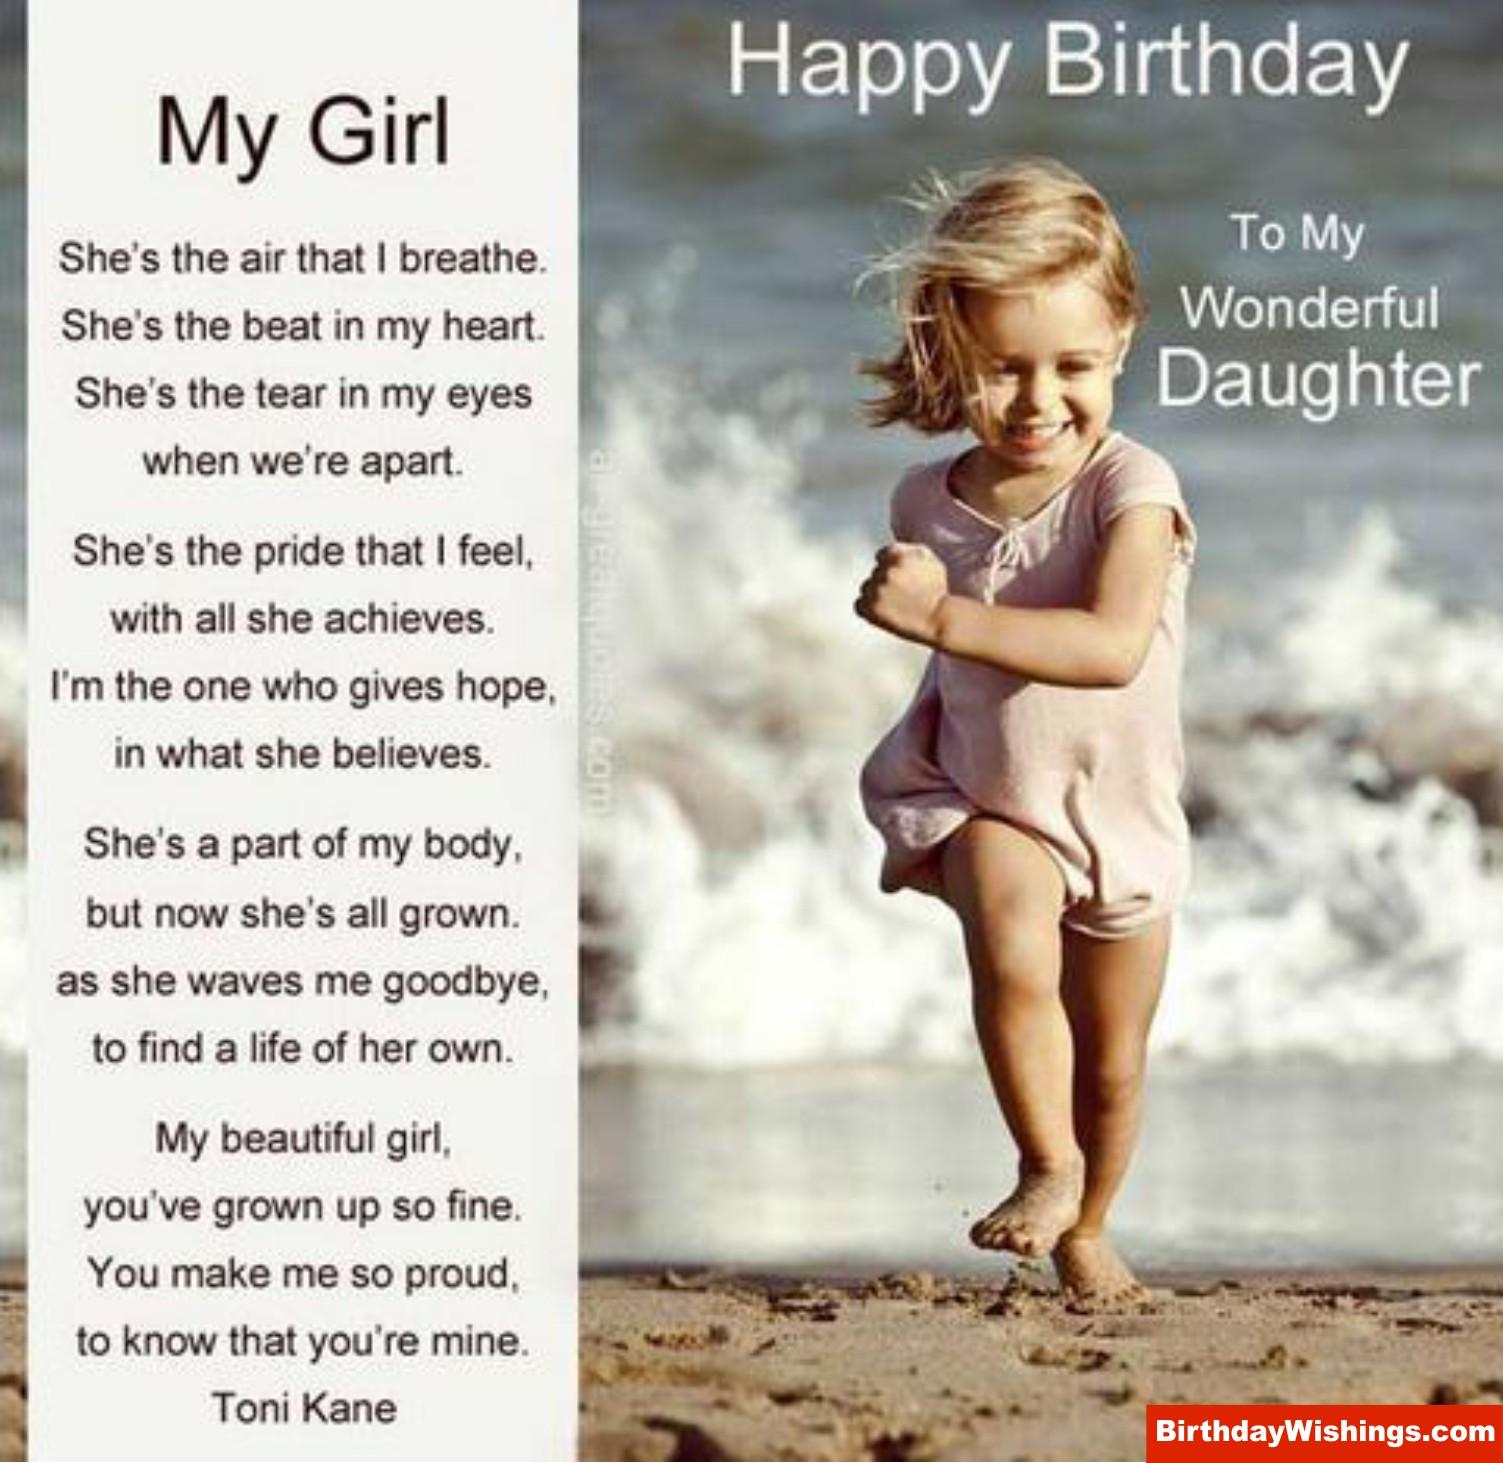 Wonderful Daughter Birthday Poem Poem For Daughter